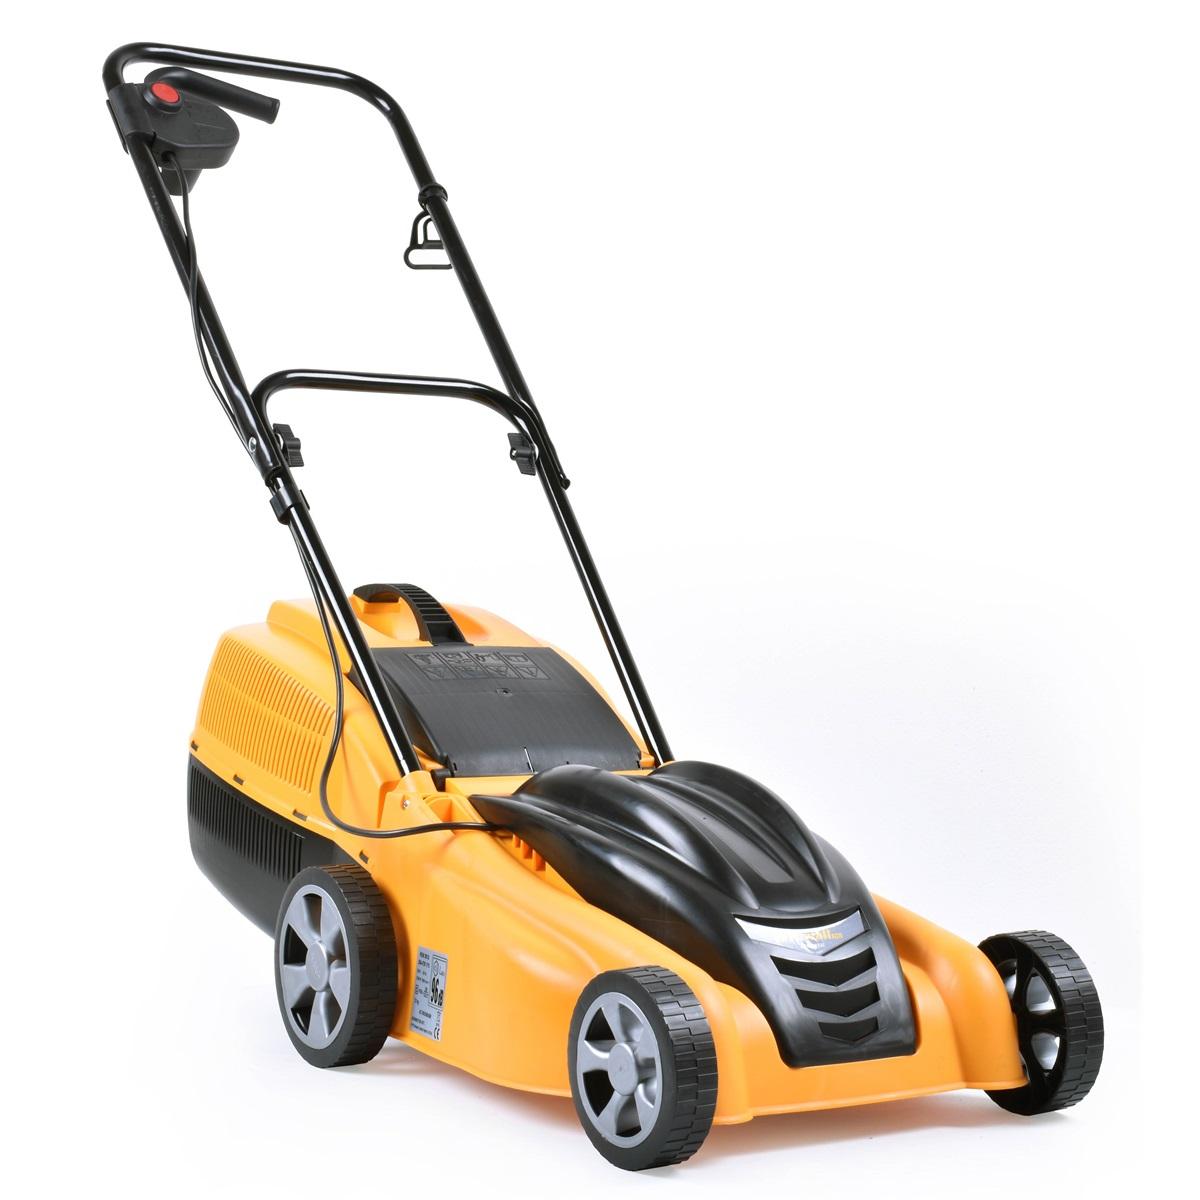 Riwall PRO REM 3813i, trávna kosačka s indukčným motorom 2 v 1